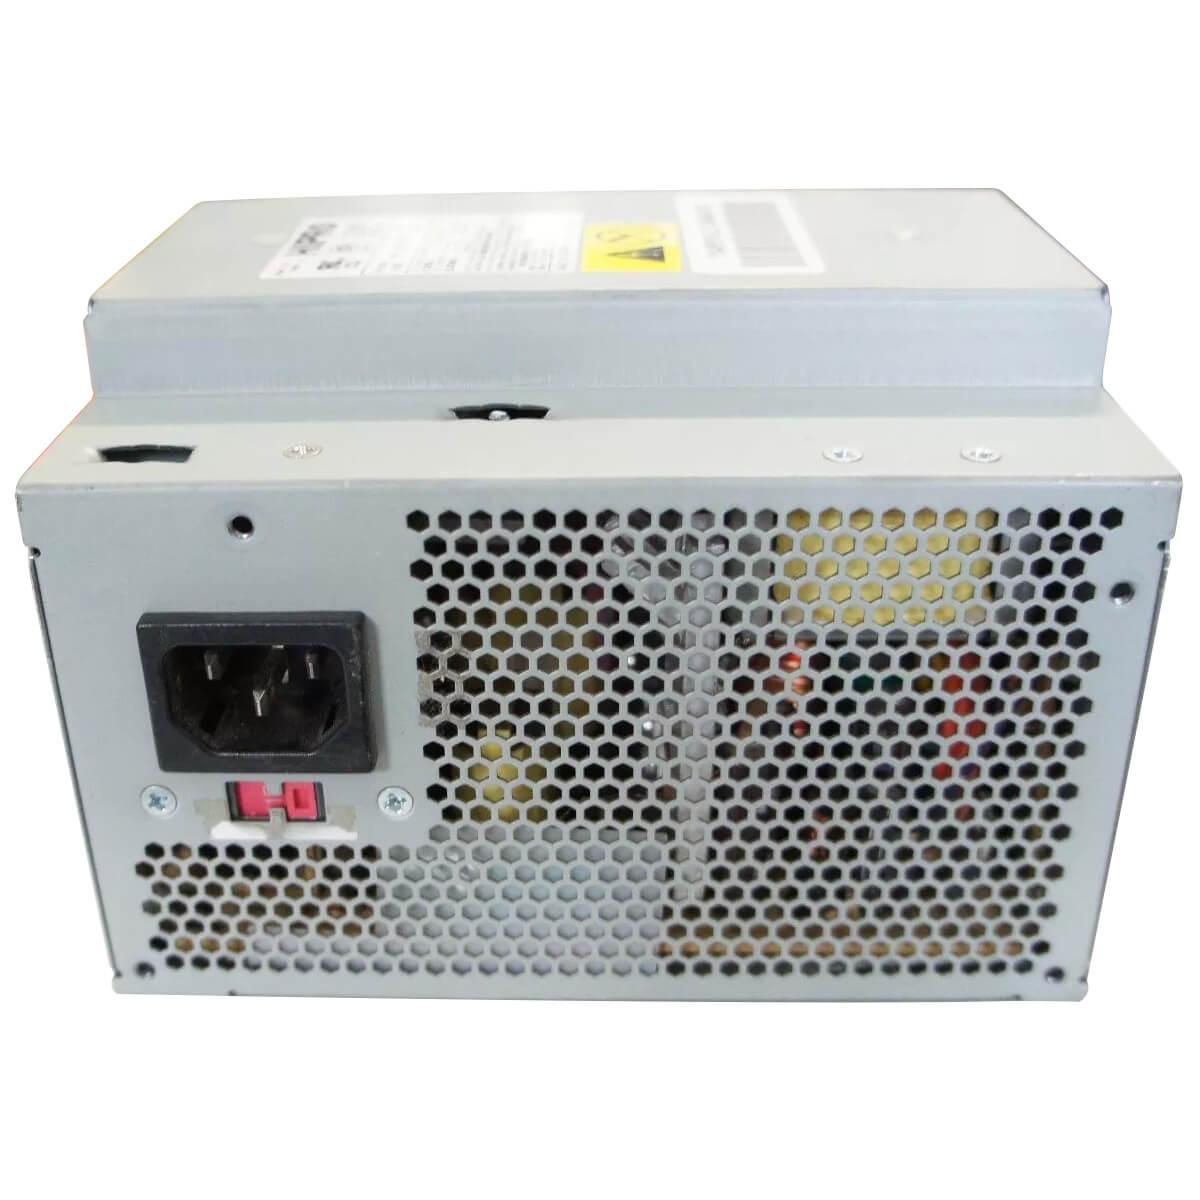 Fonte HIPRO HP-A2307F3T 230w 20 Pinos - Usada